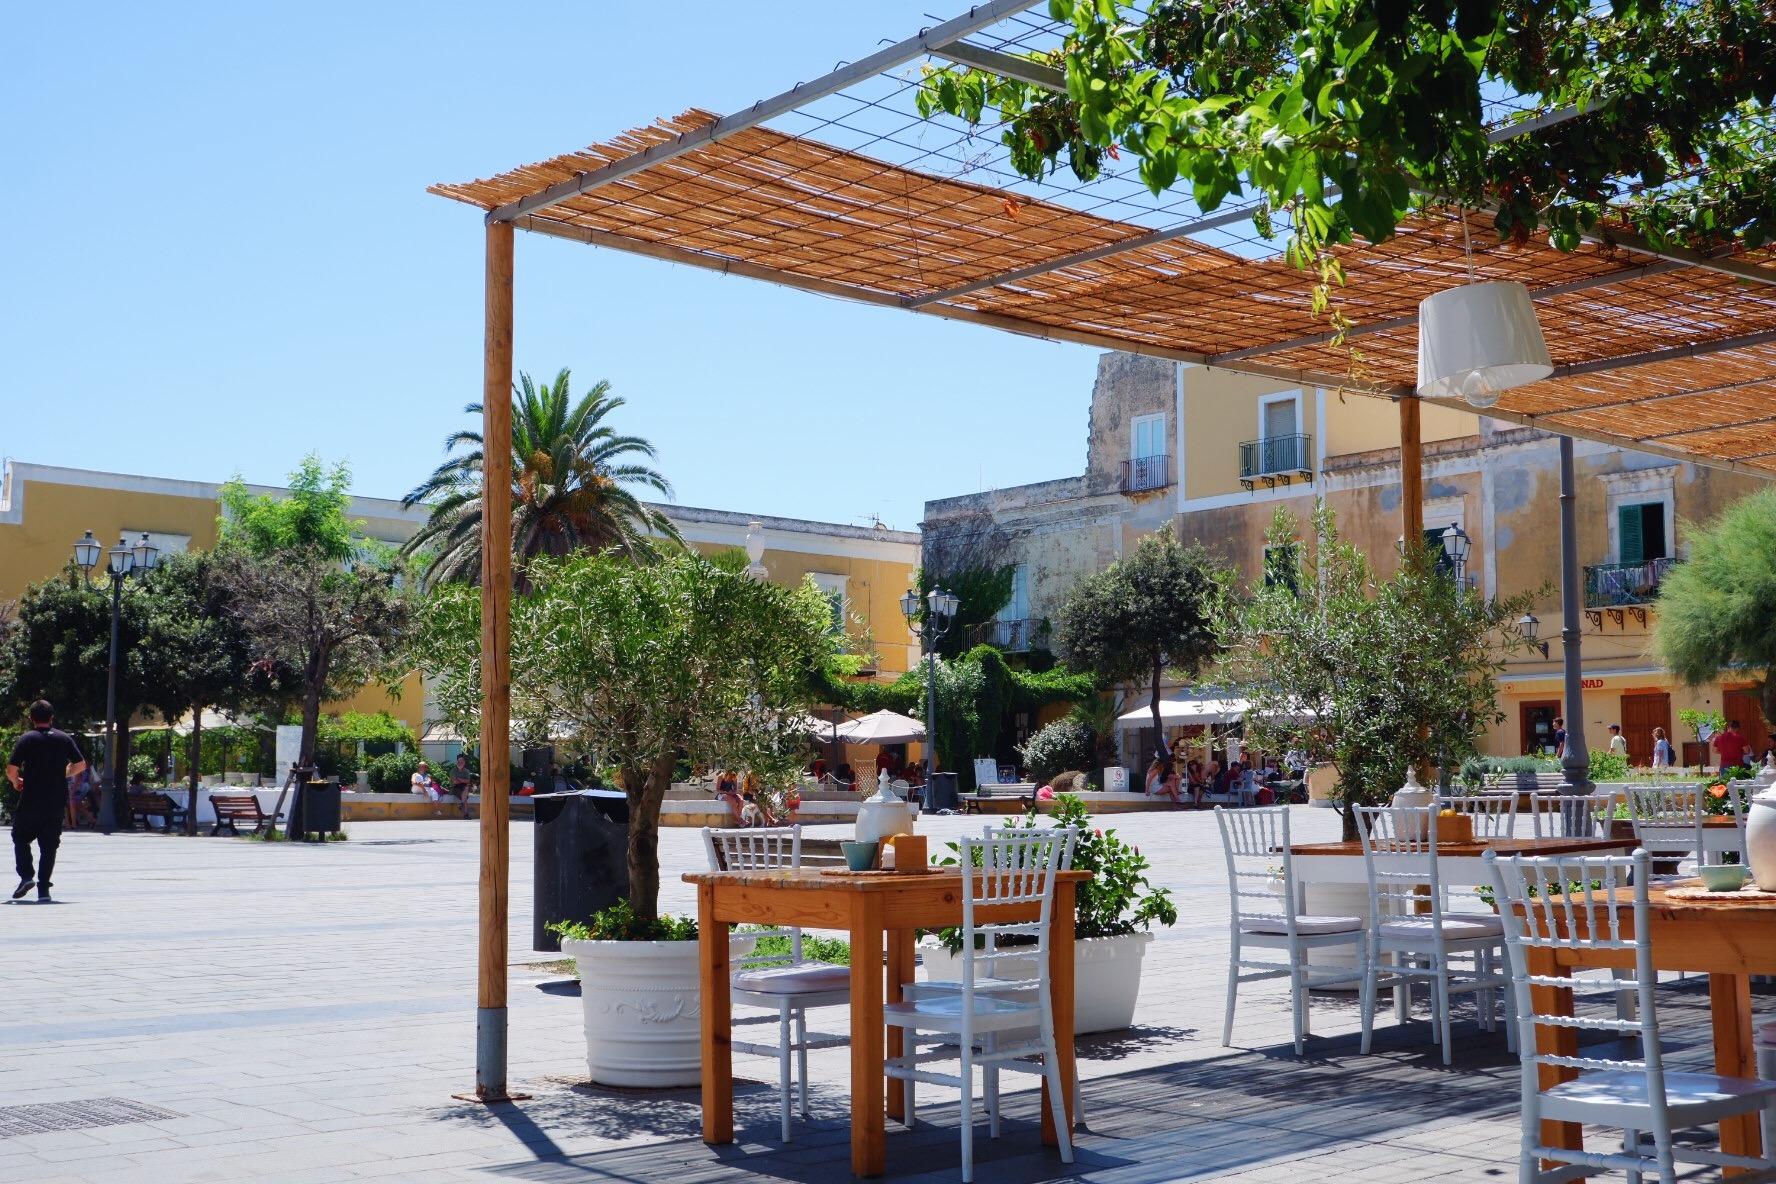 Ventotene main square